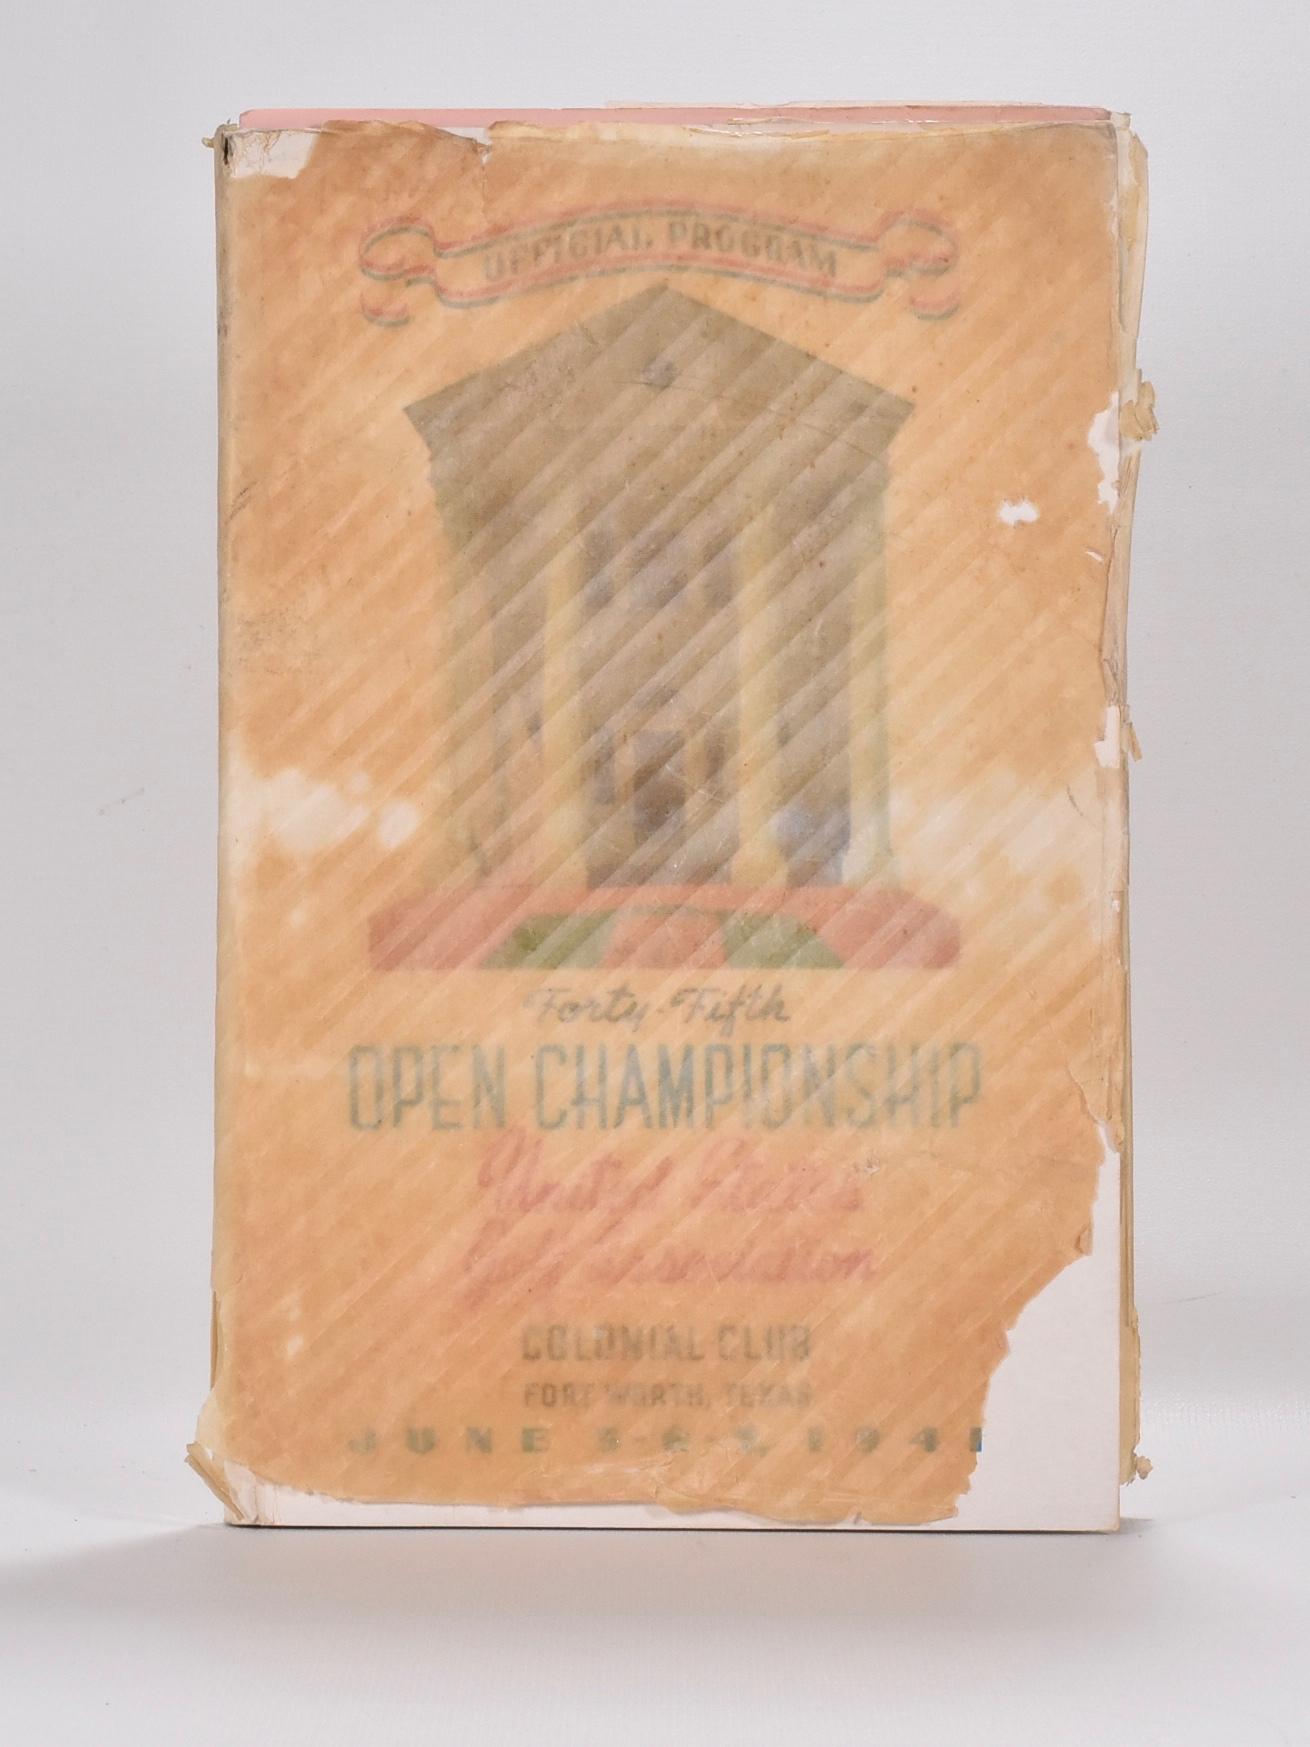 The 45th U.S. Open Championship Program. U.S.G.A.